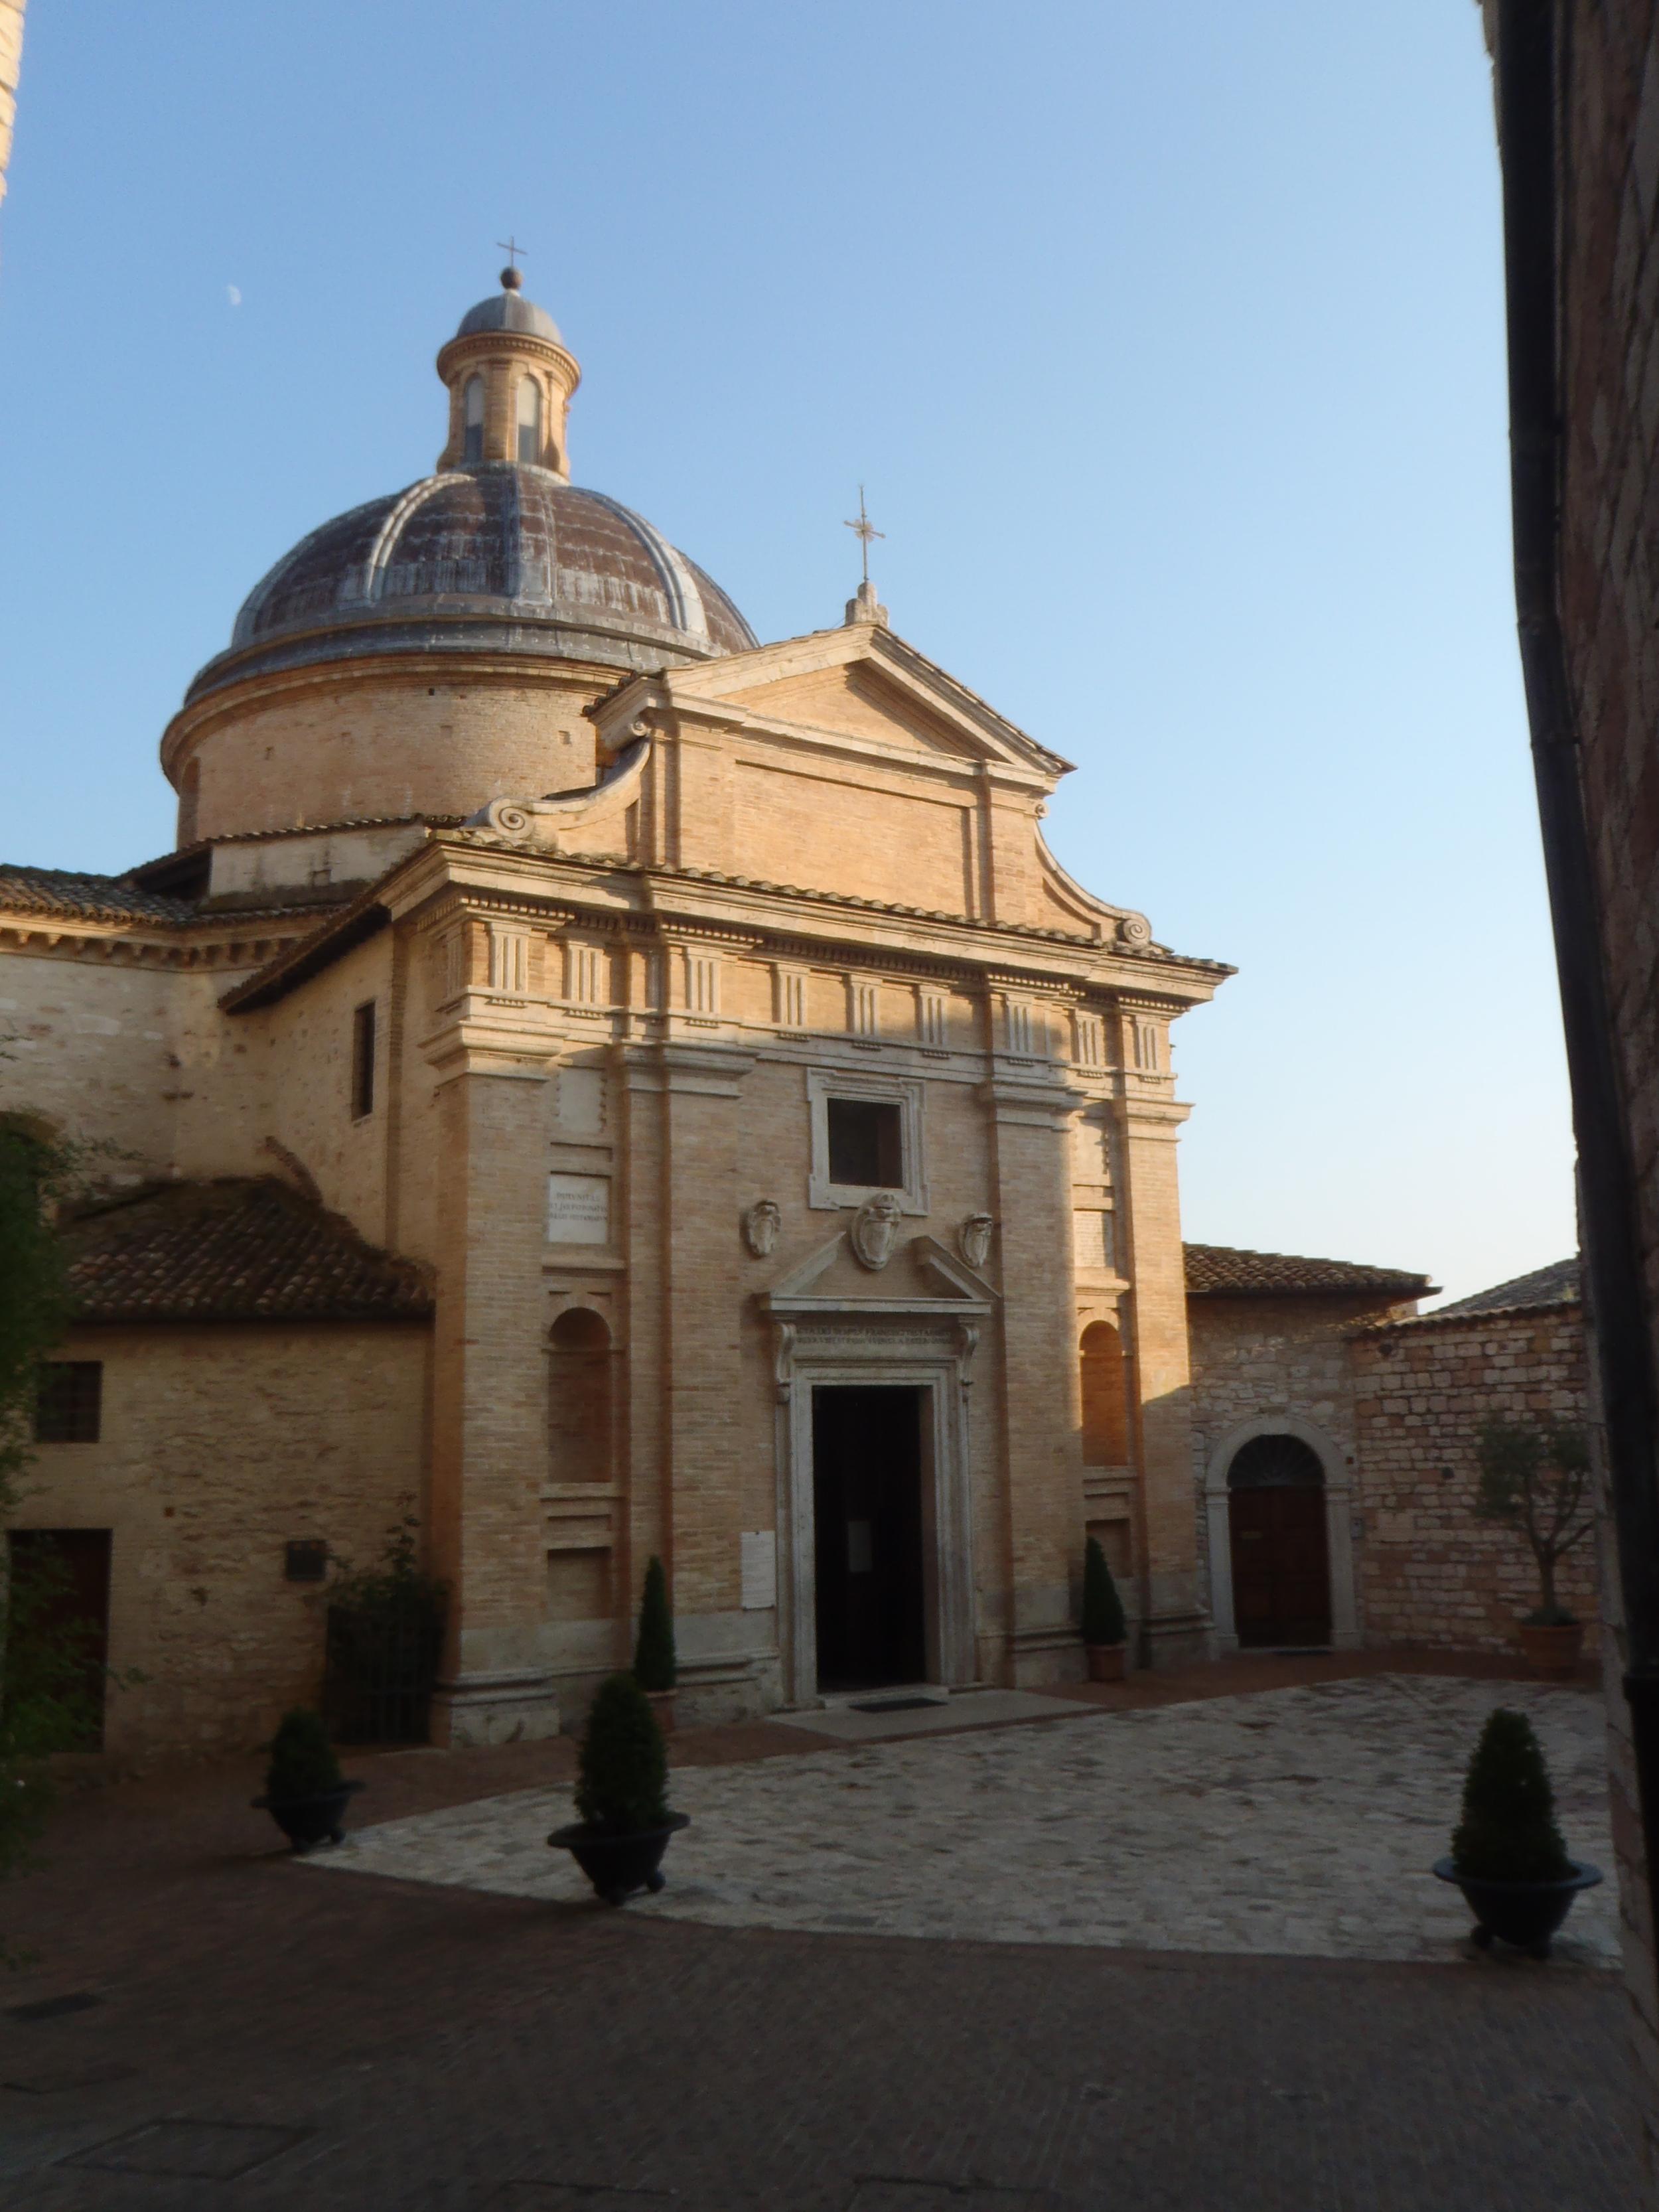 CRO Italy web 2013 - 026.JPG